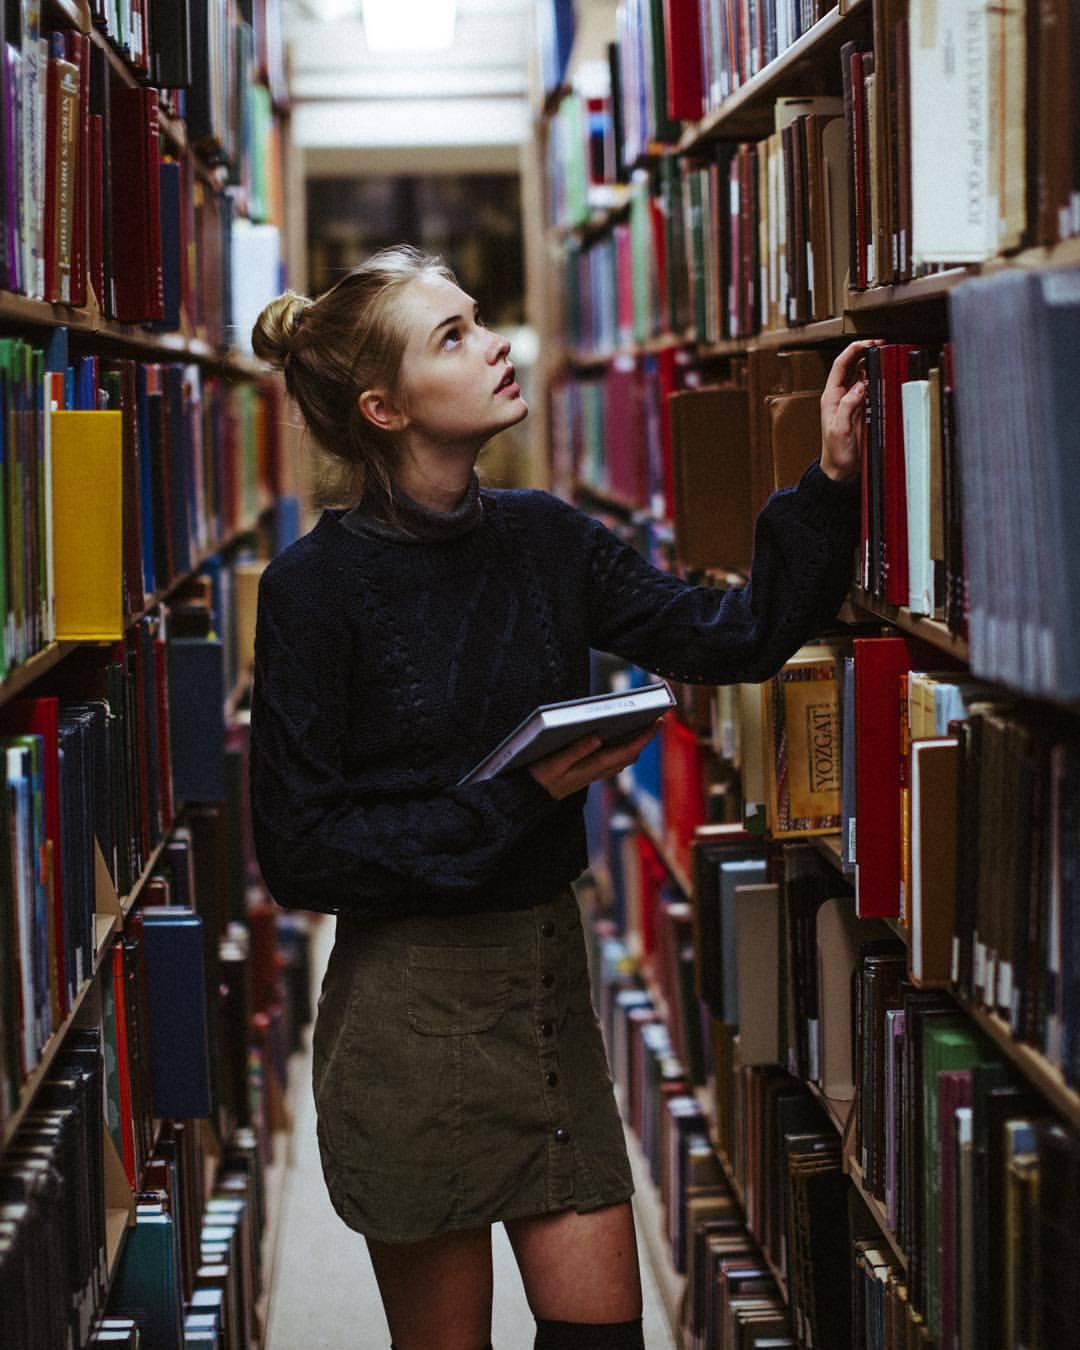 Chica en la biblioteca